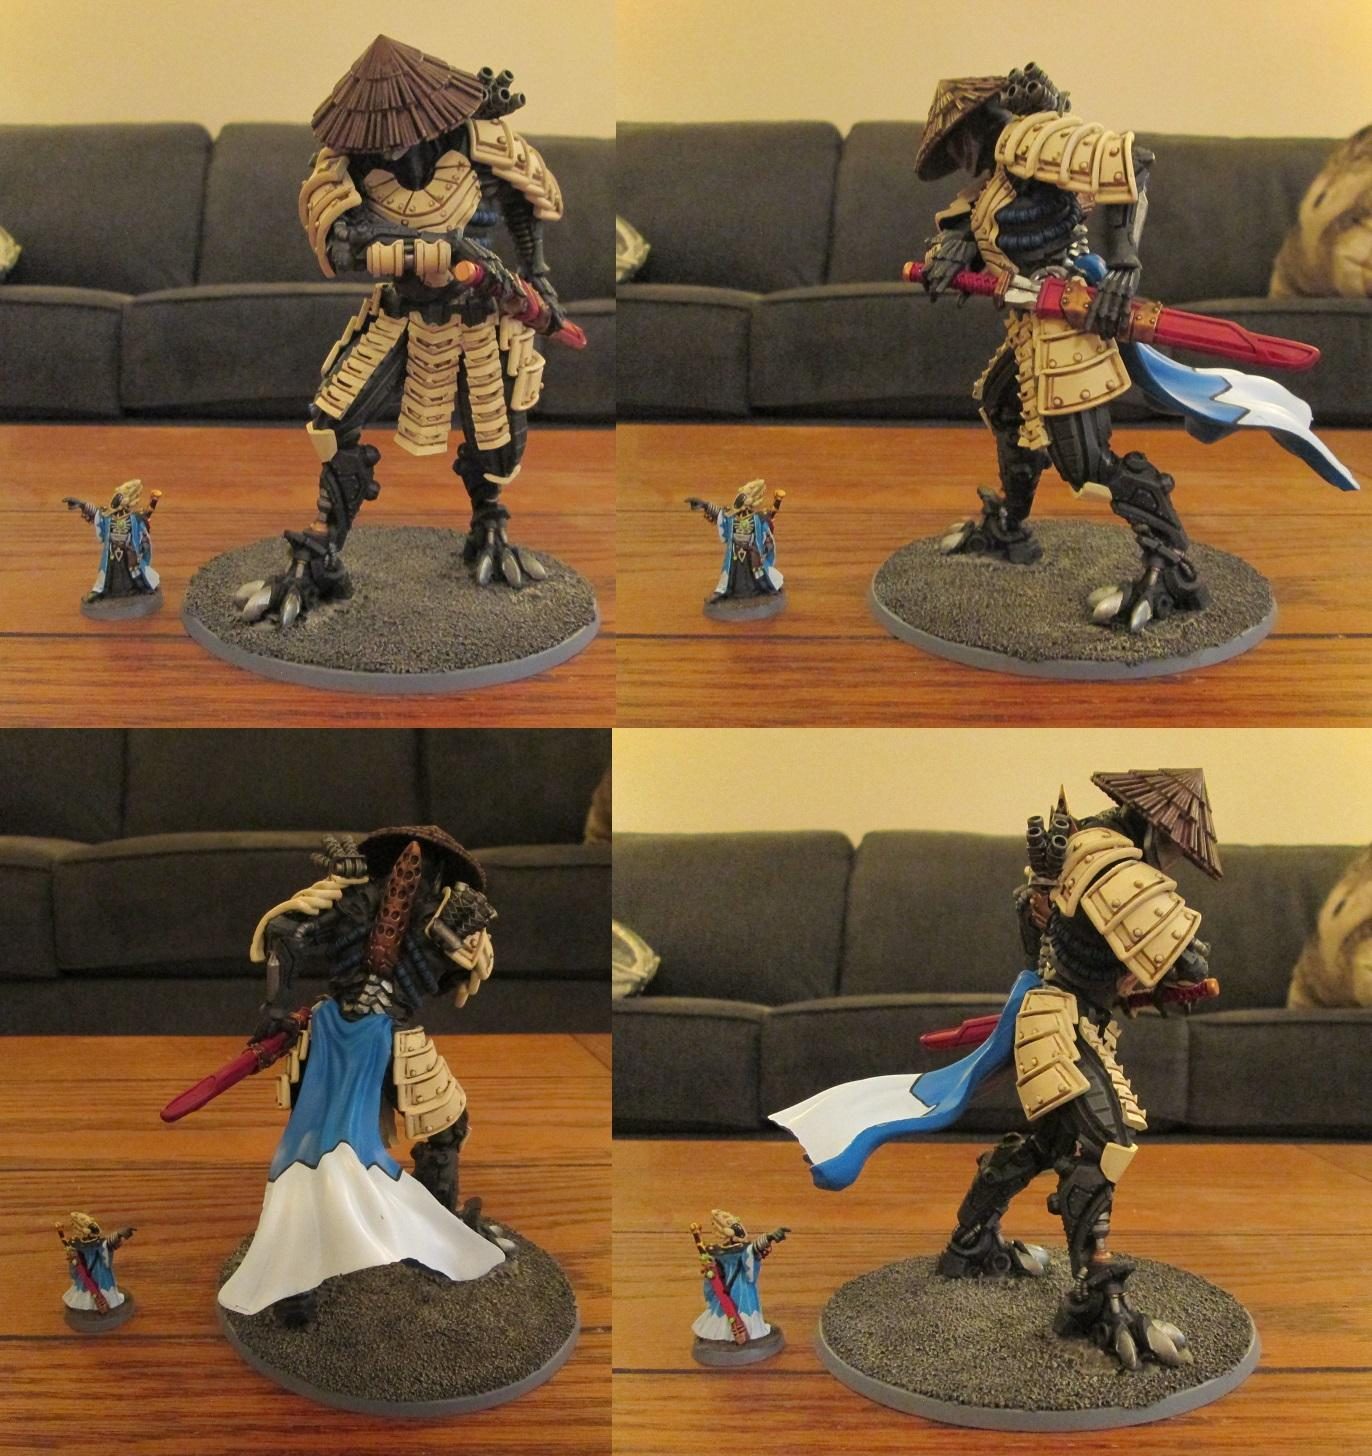 Mecha, Mishima, Robot, Samurai, Warzone